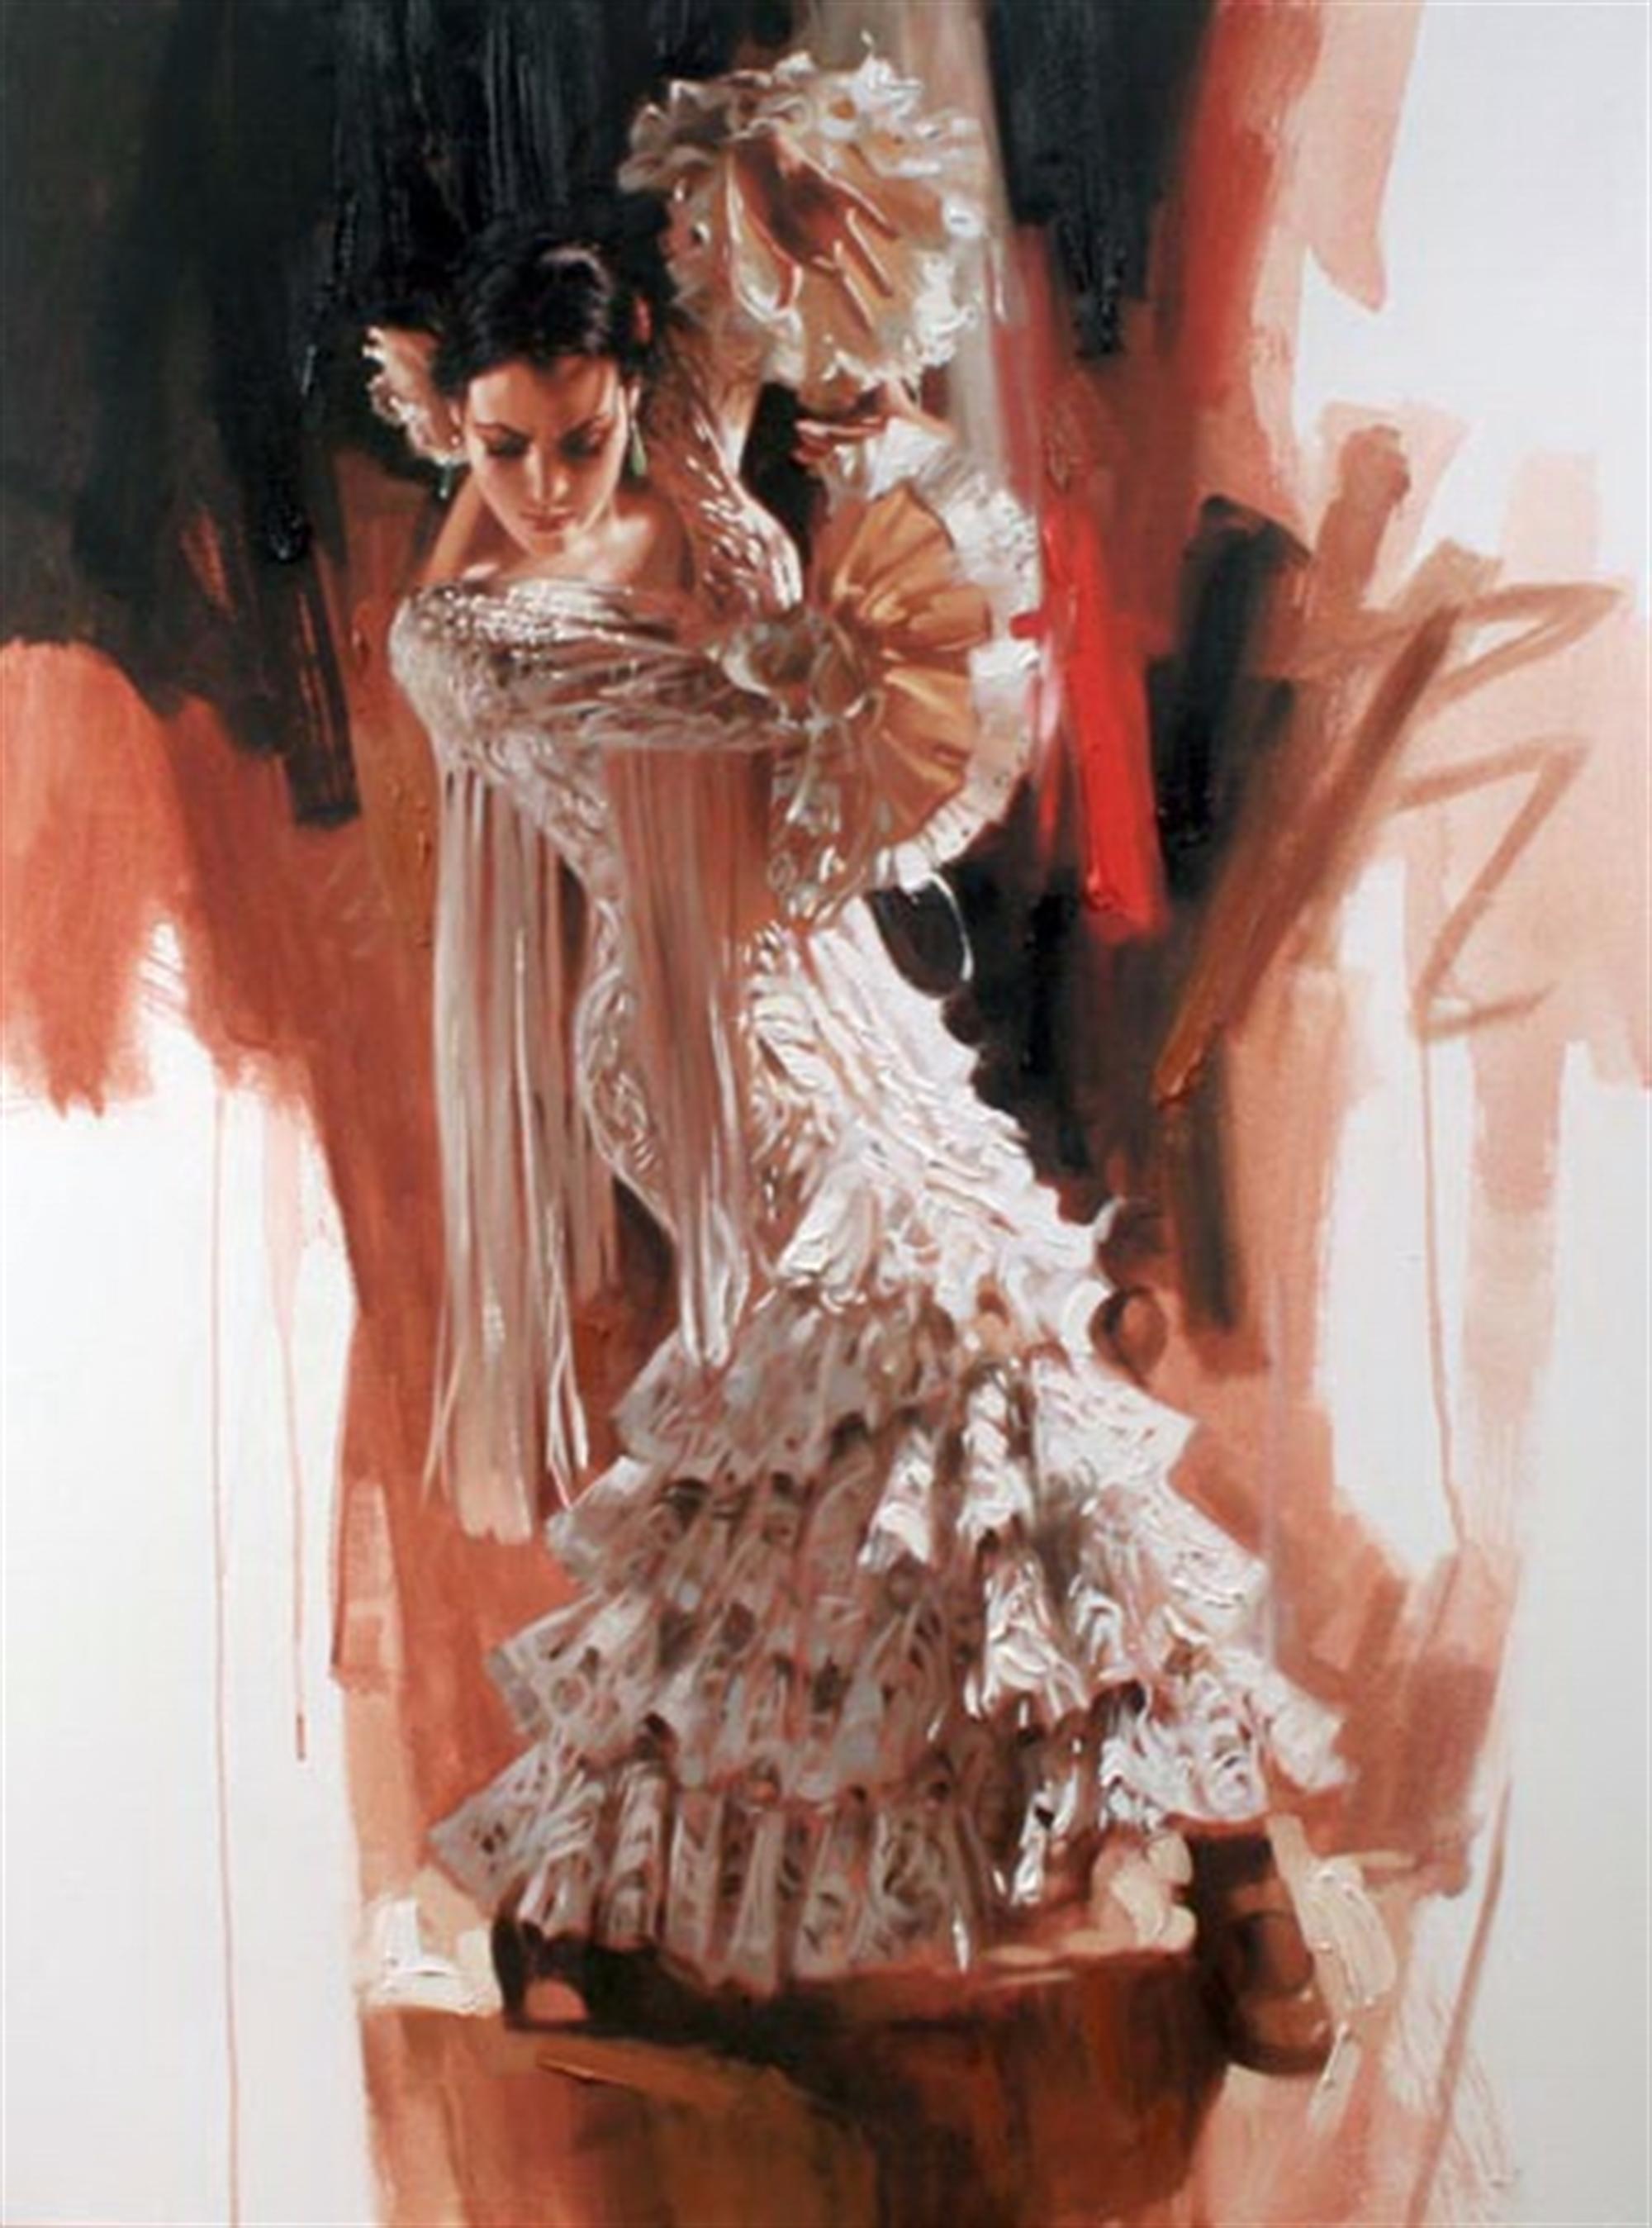 La Reina by Richard Johnson